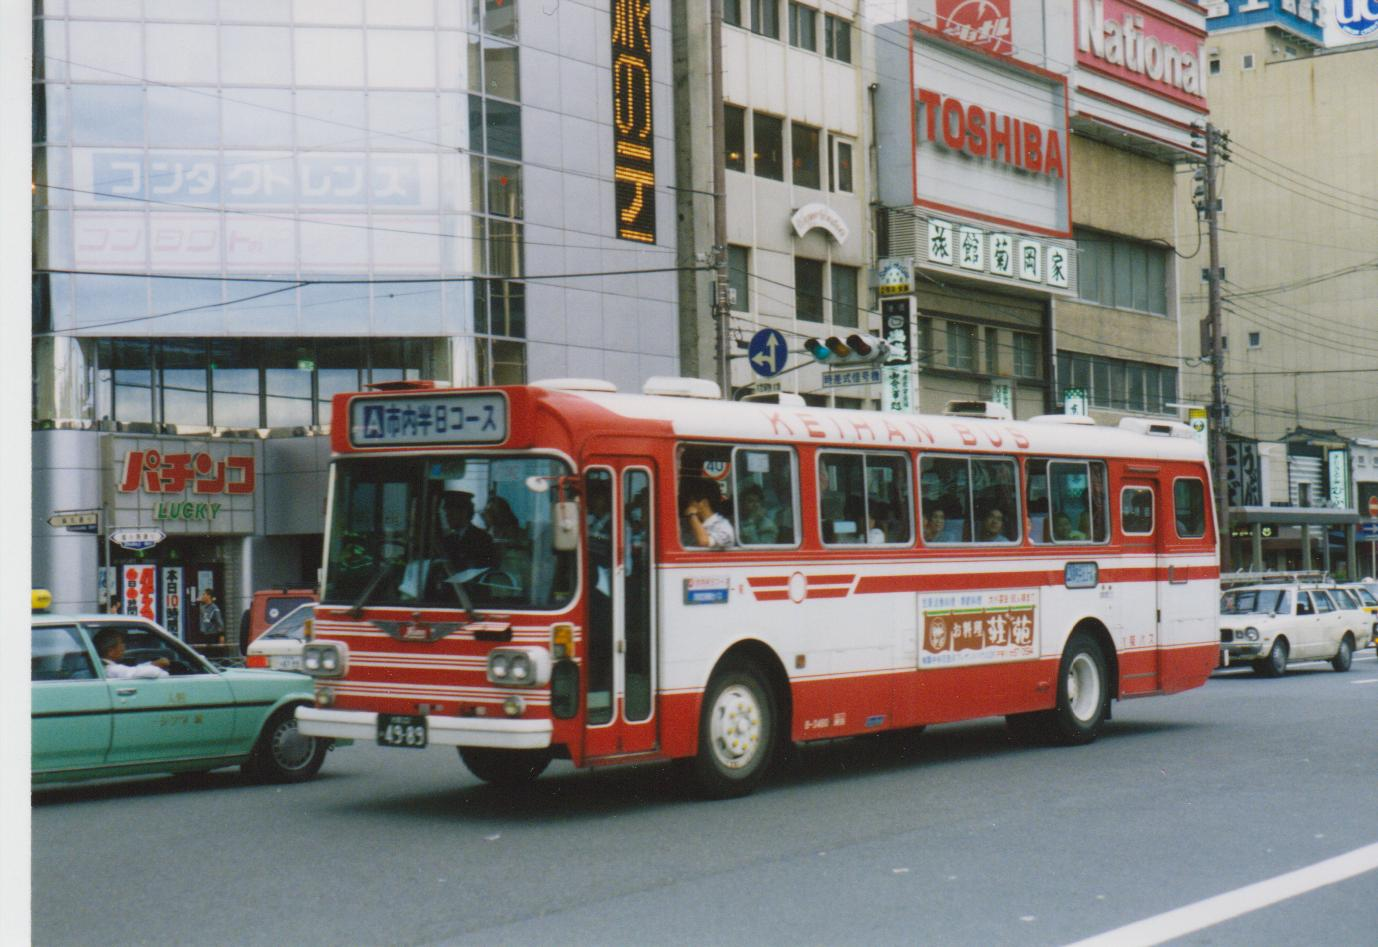 青いバス停Ⅱ 京阪バス《枚方》現在完了進行形⑧